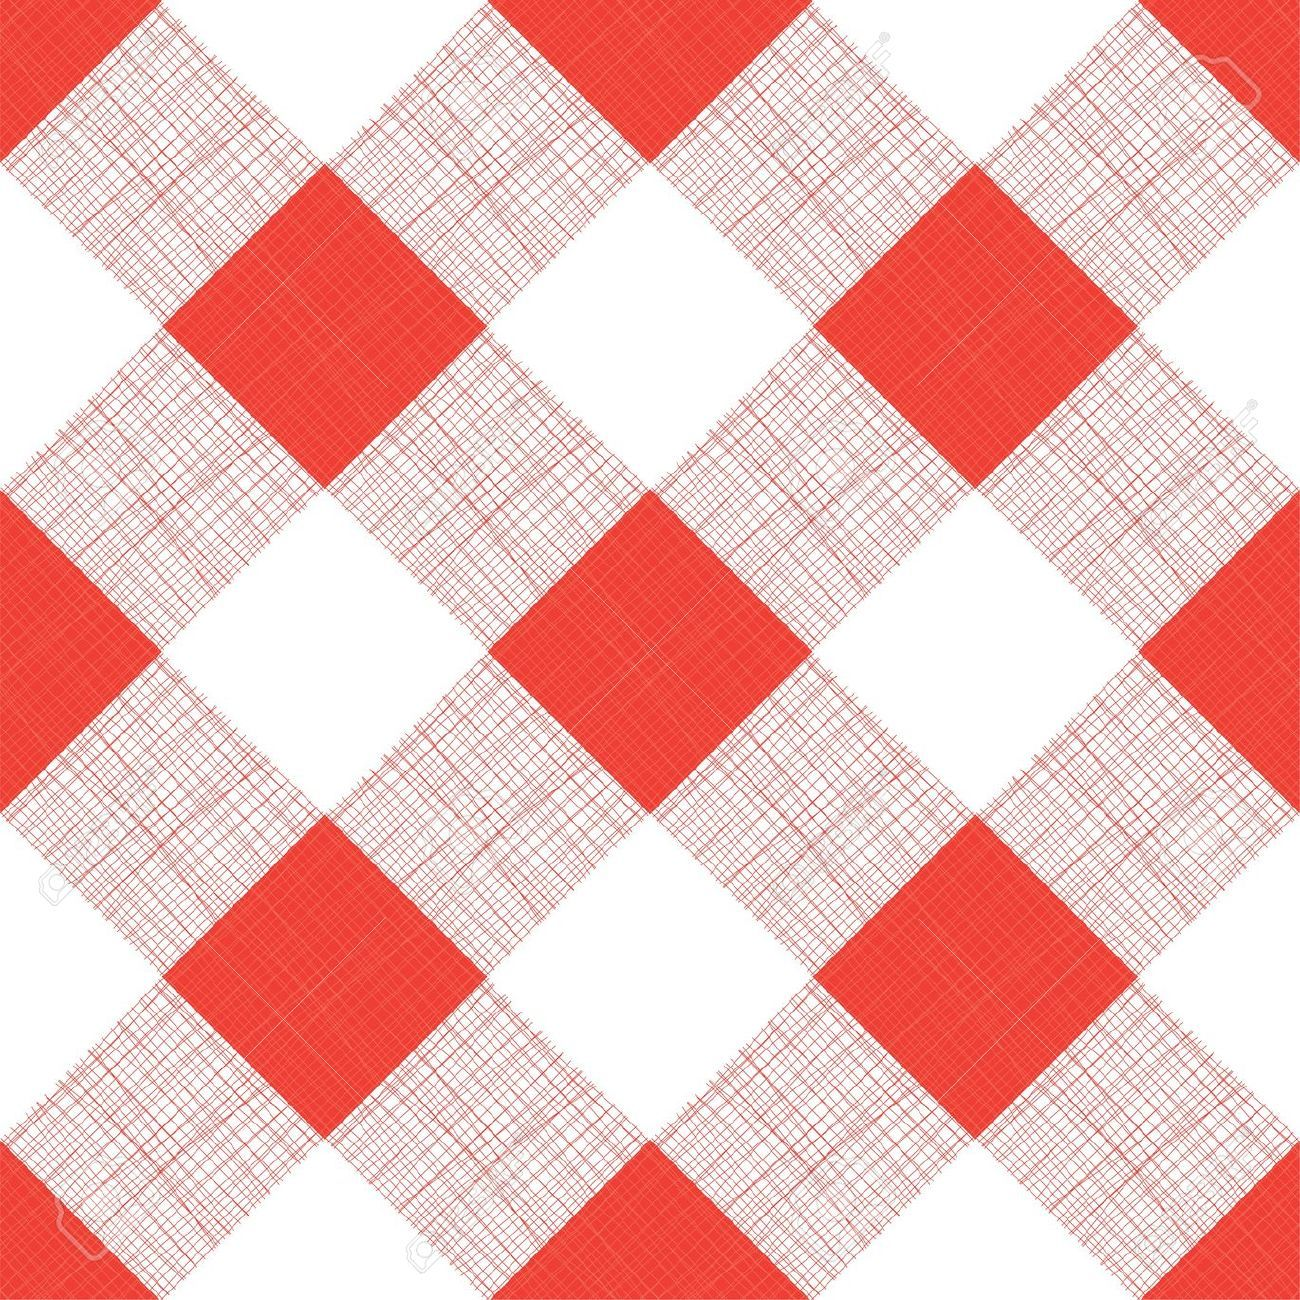 16031140 Vector Seamless Picnic Tablecloth Pattern Stock Vector